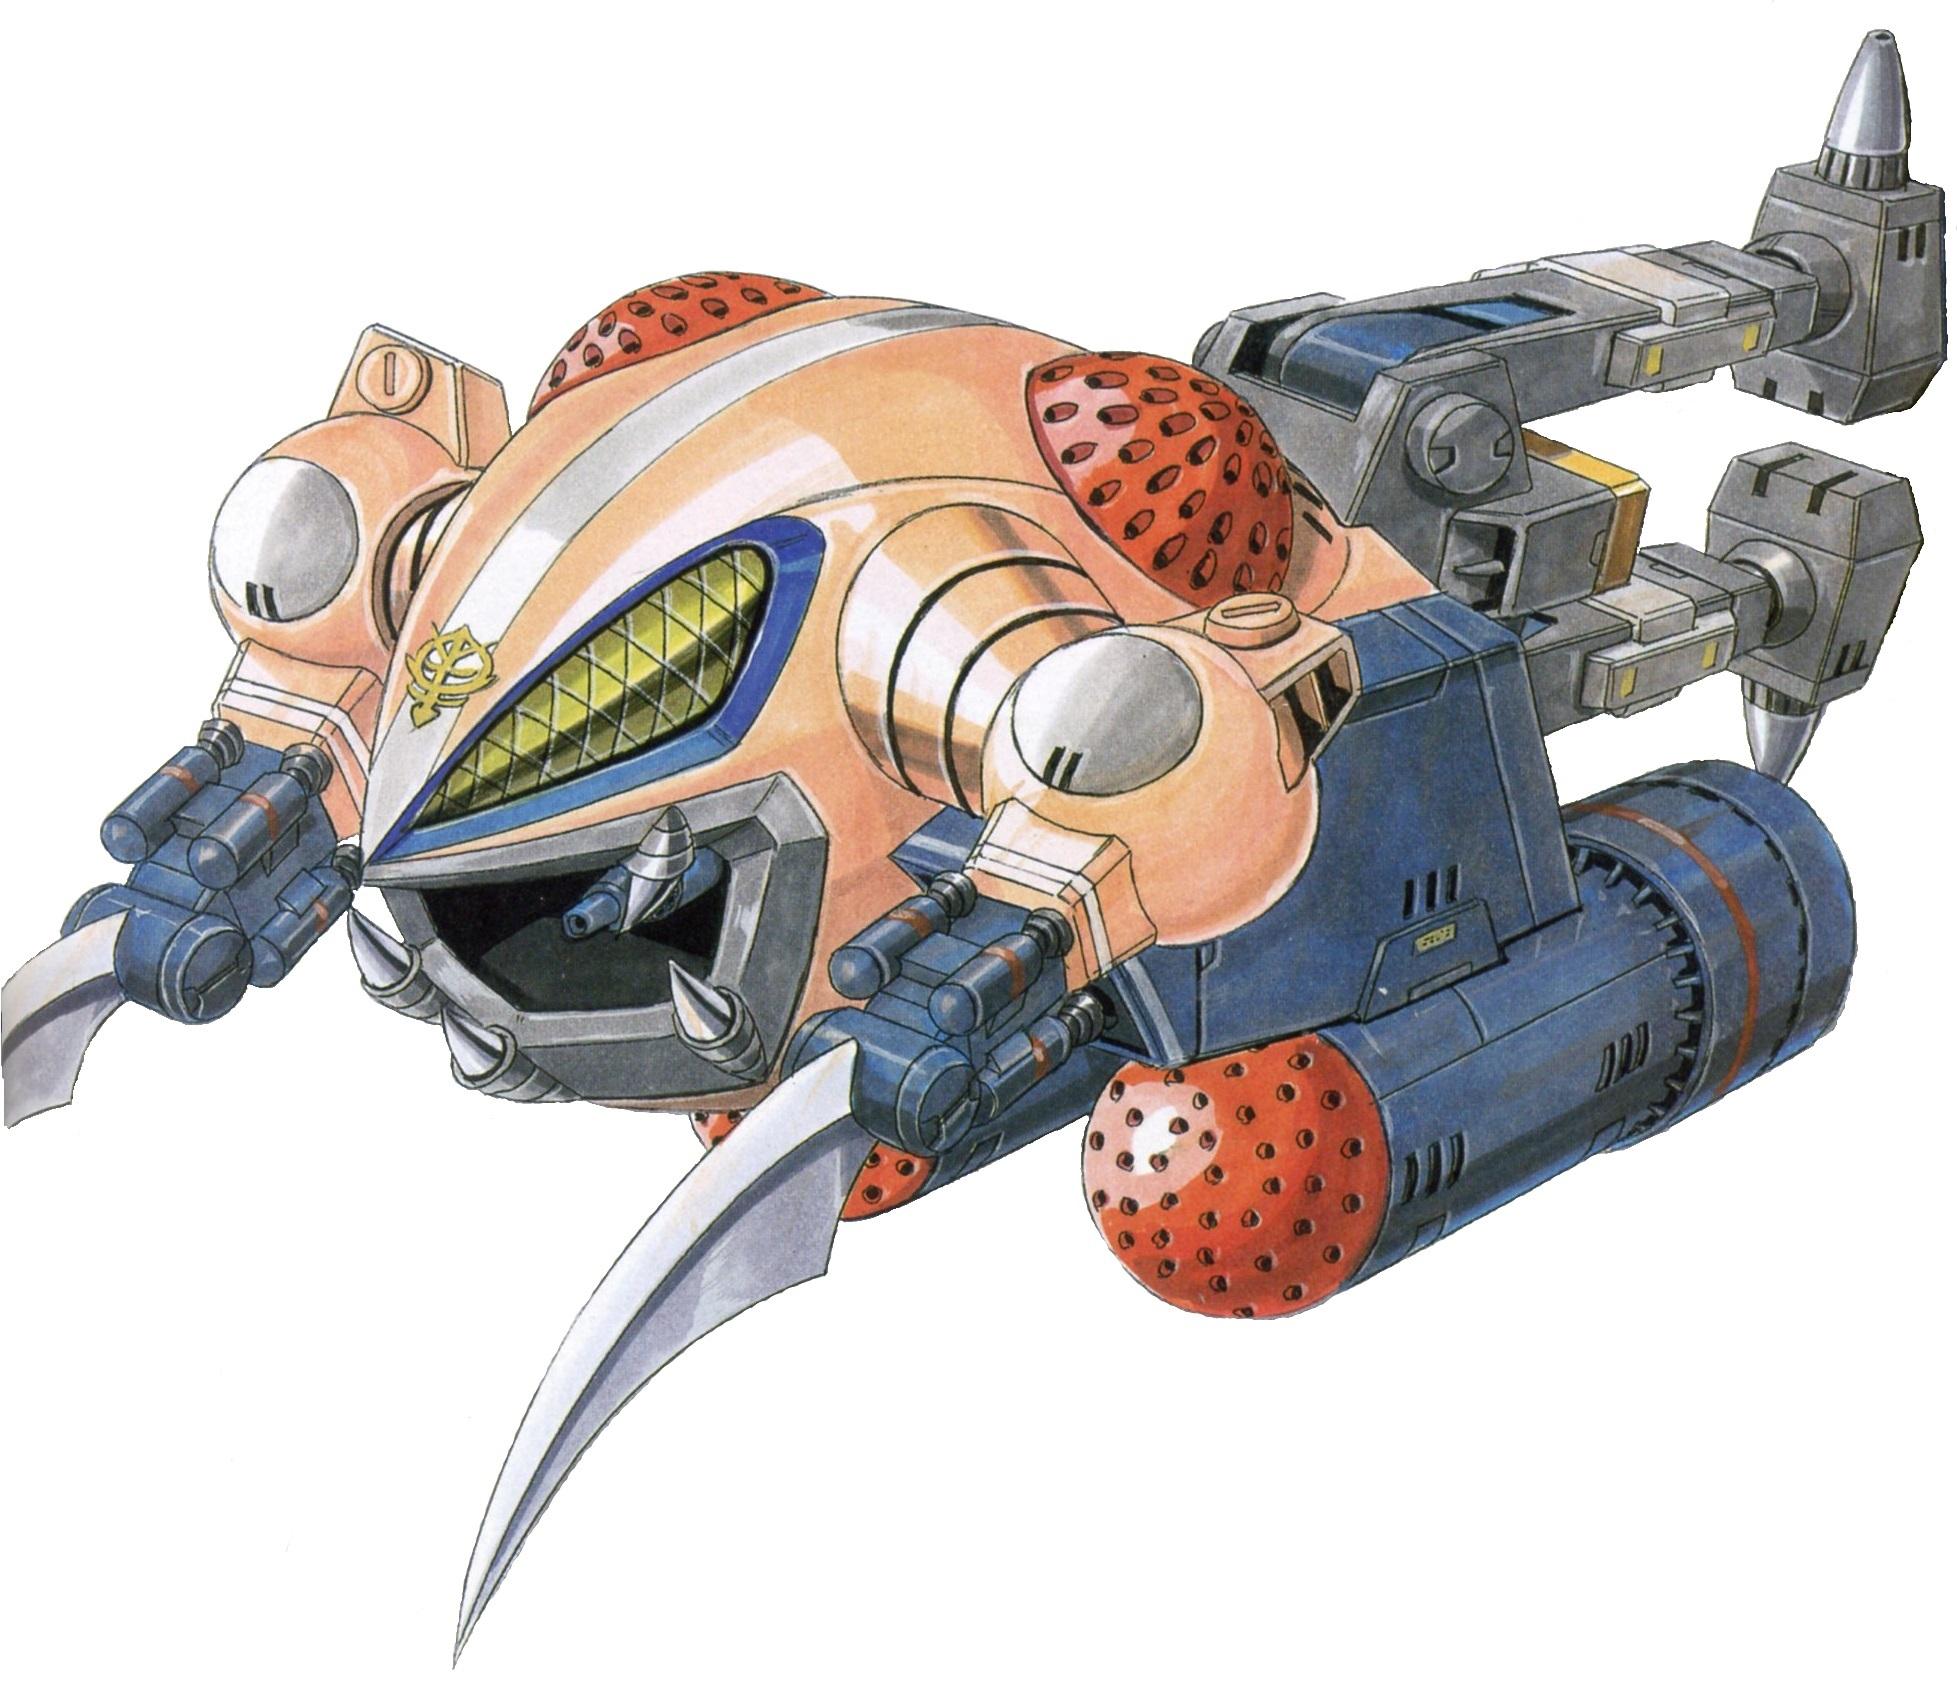 MAN-00X-2布拉尼罗